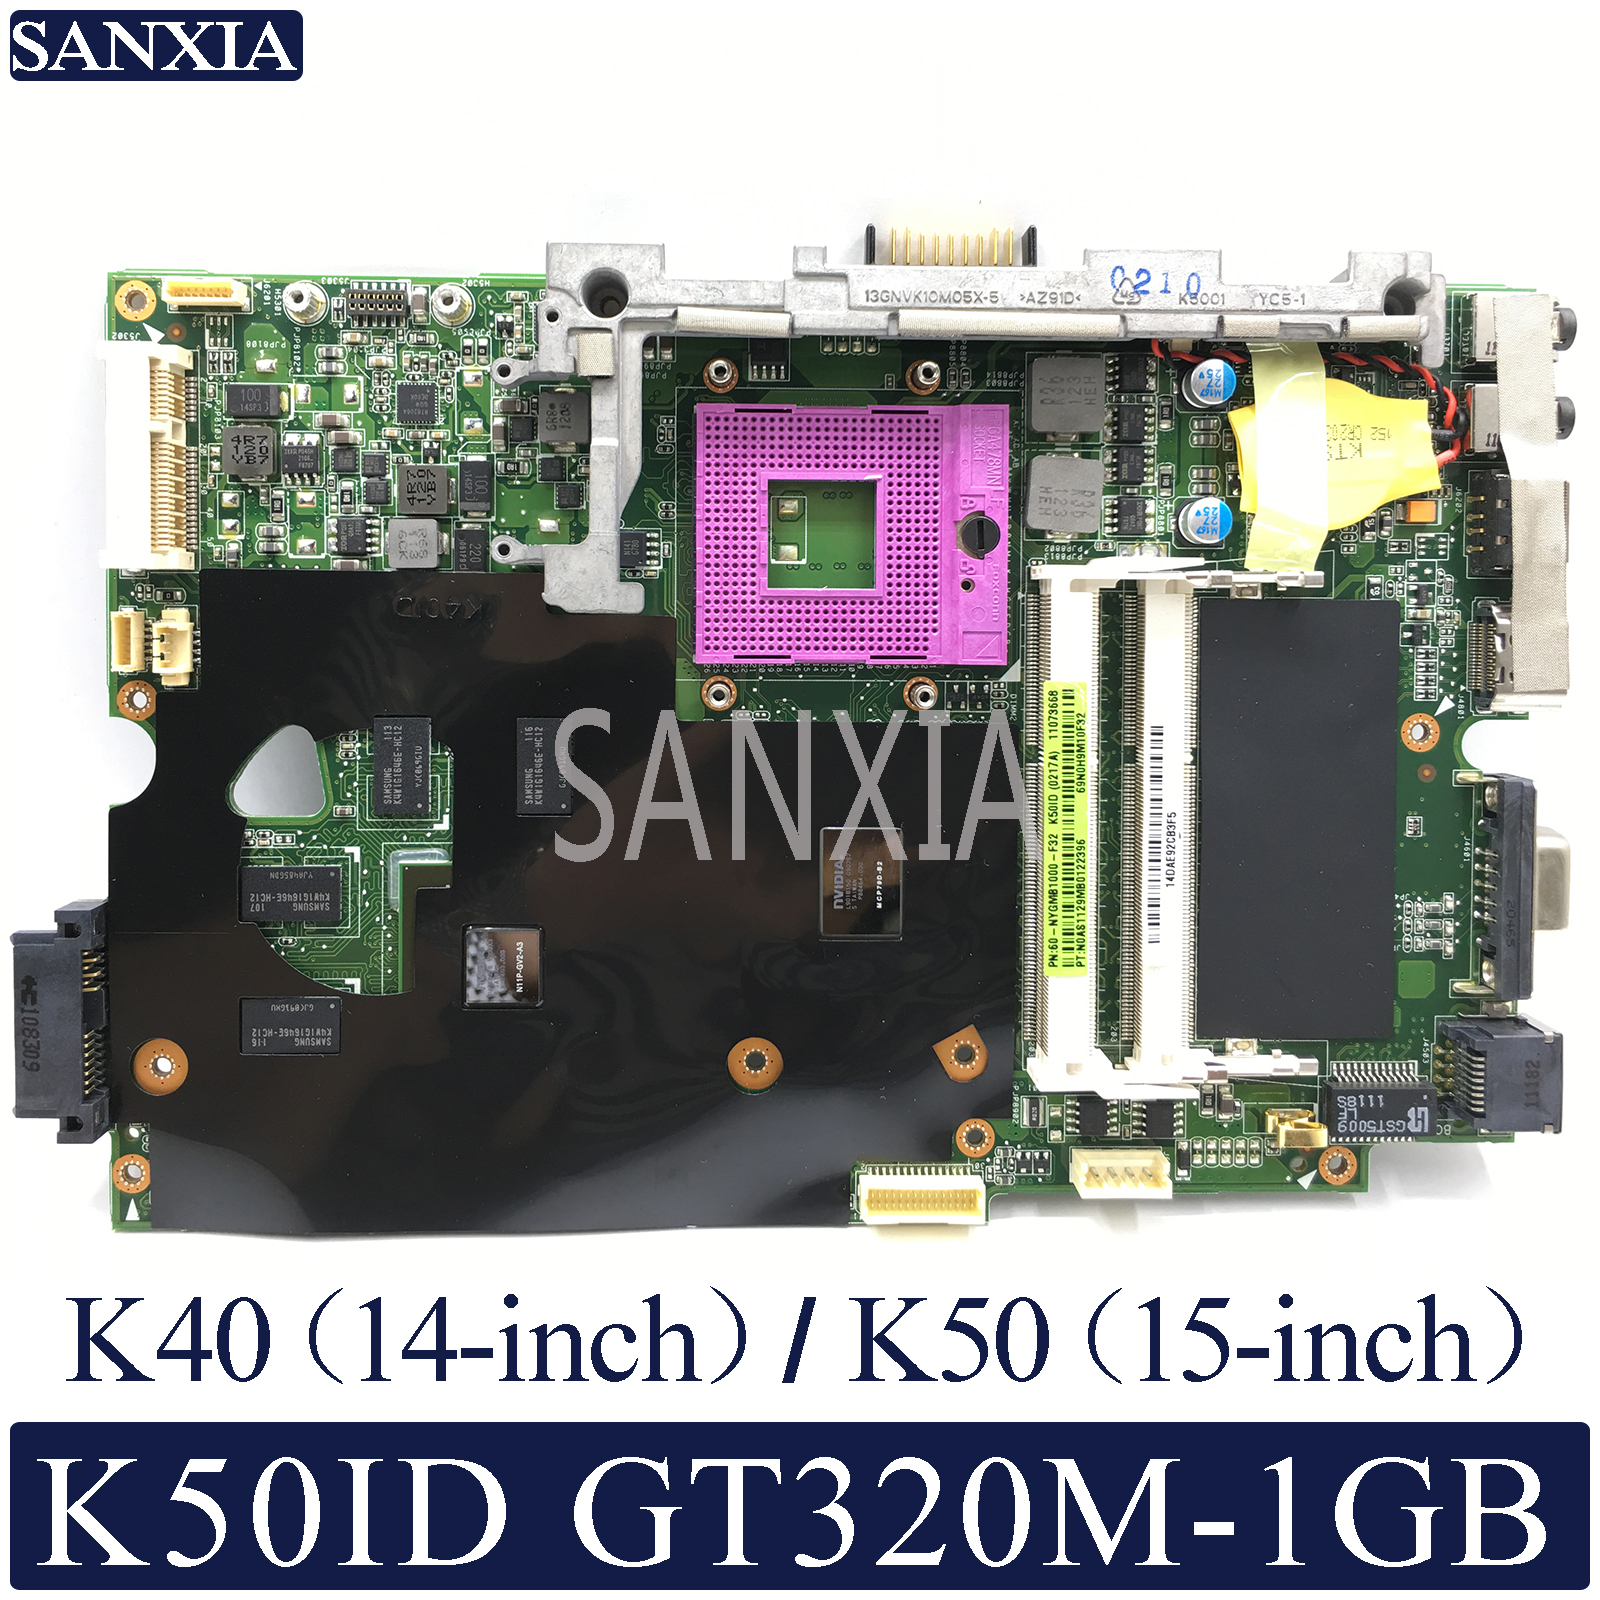 KEFU K40ID Laptop Motherboard For ASUS K50ID K40IE K50IE Original Mainboard DDR3-RAM GT320M-1GB